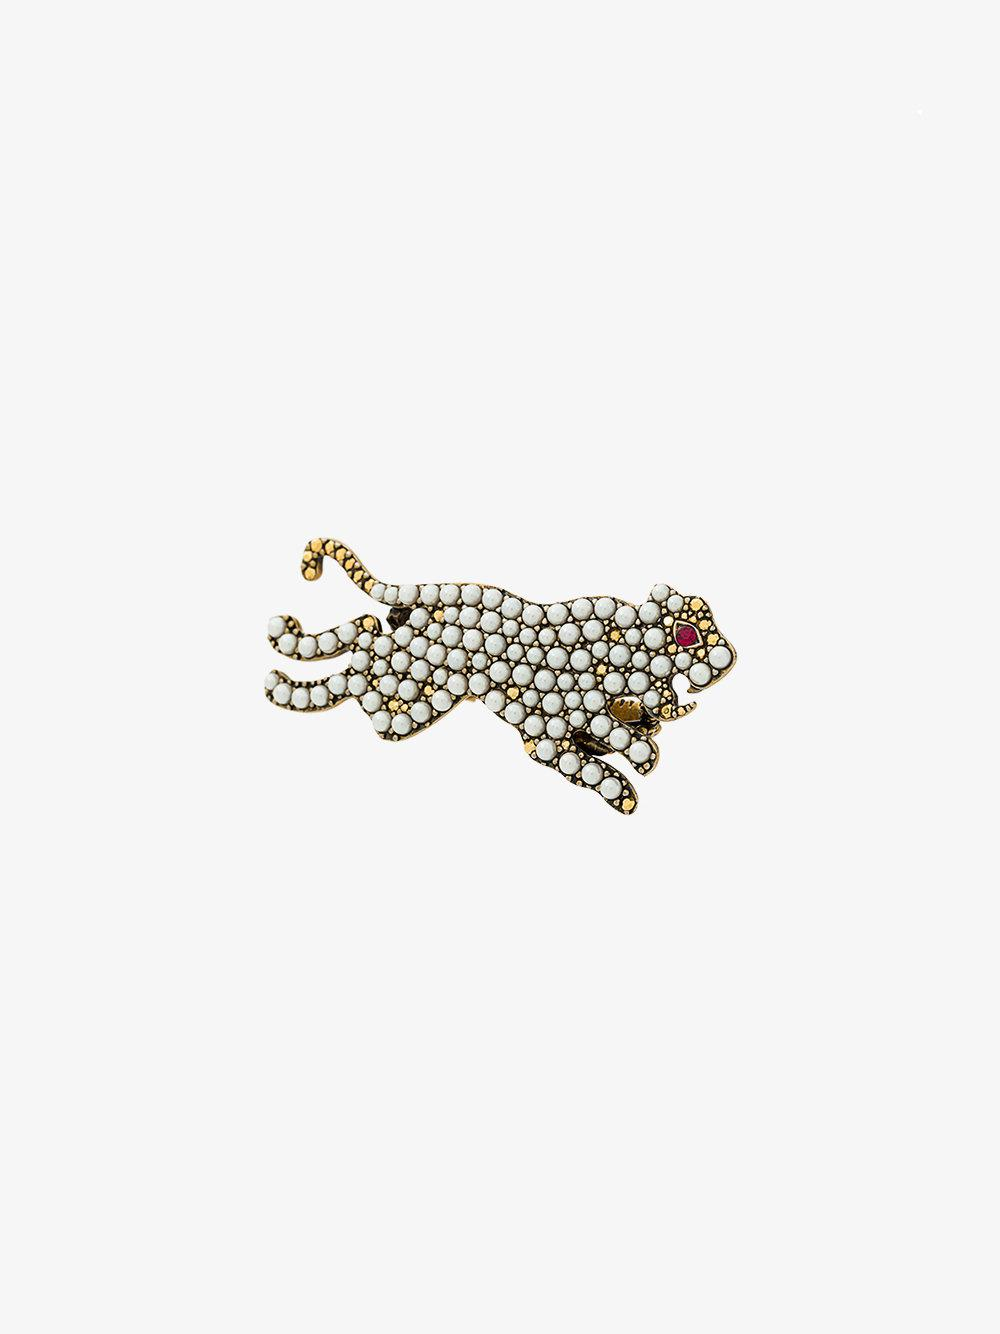 tiger multi-finger ring - Metallic Gucci 4GqvVcc